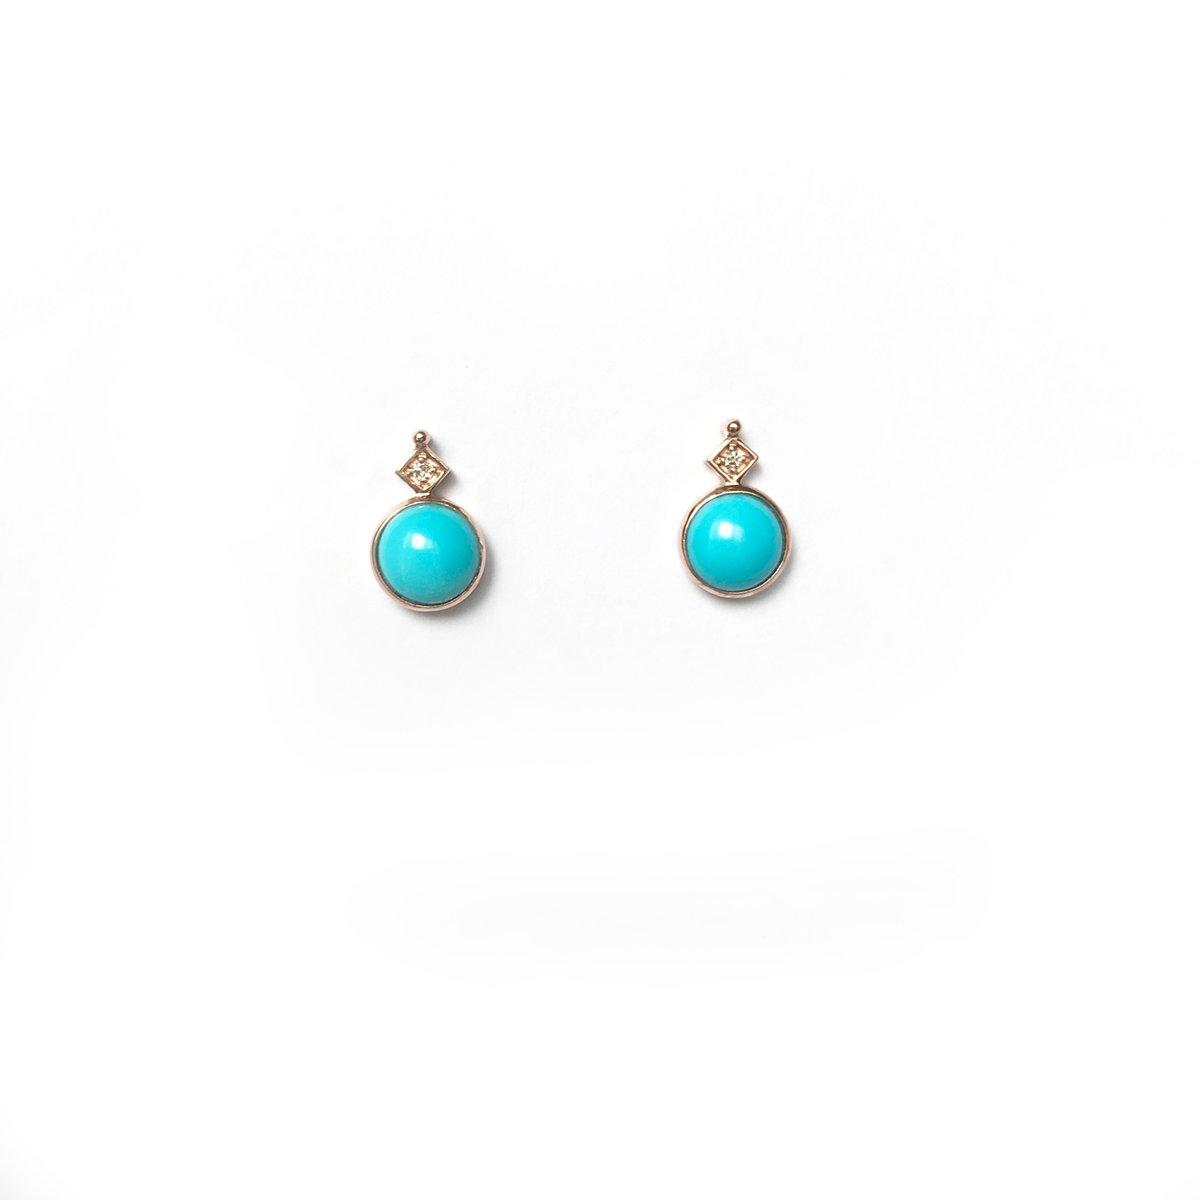 Image of Art Deco Turquoise Earring